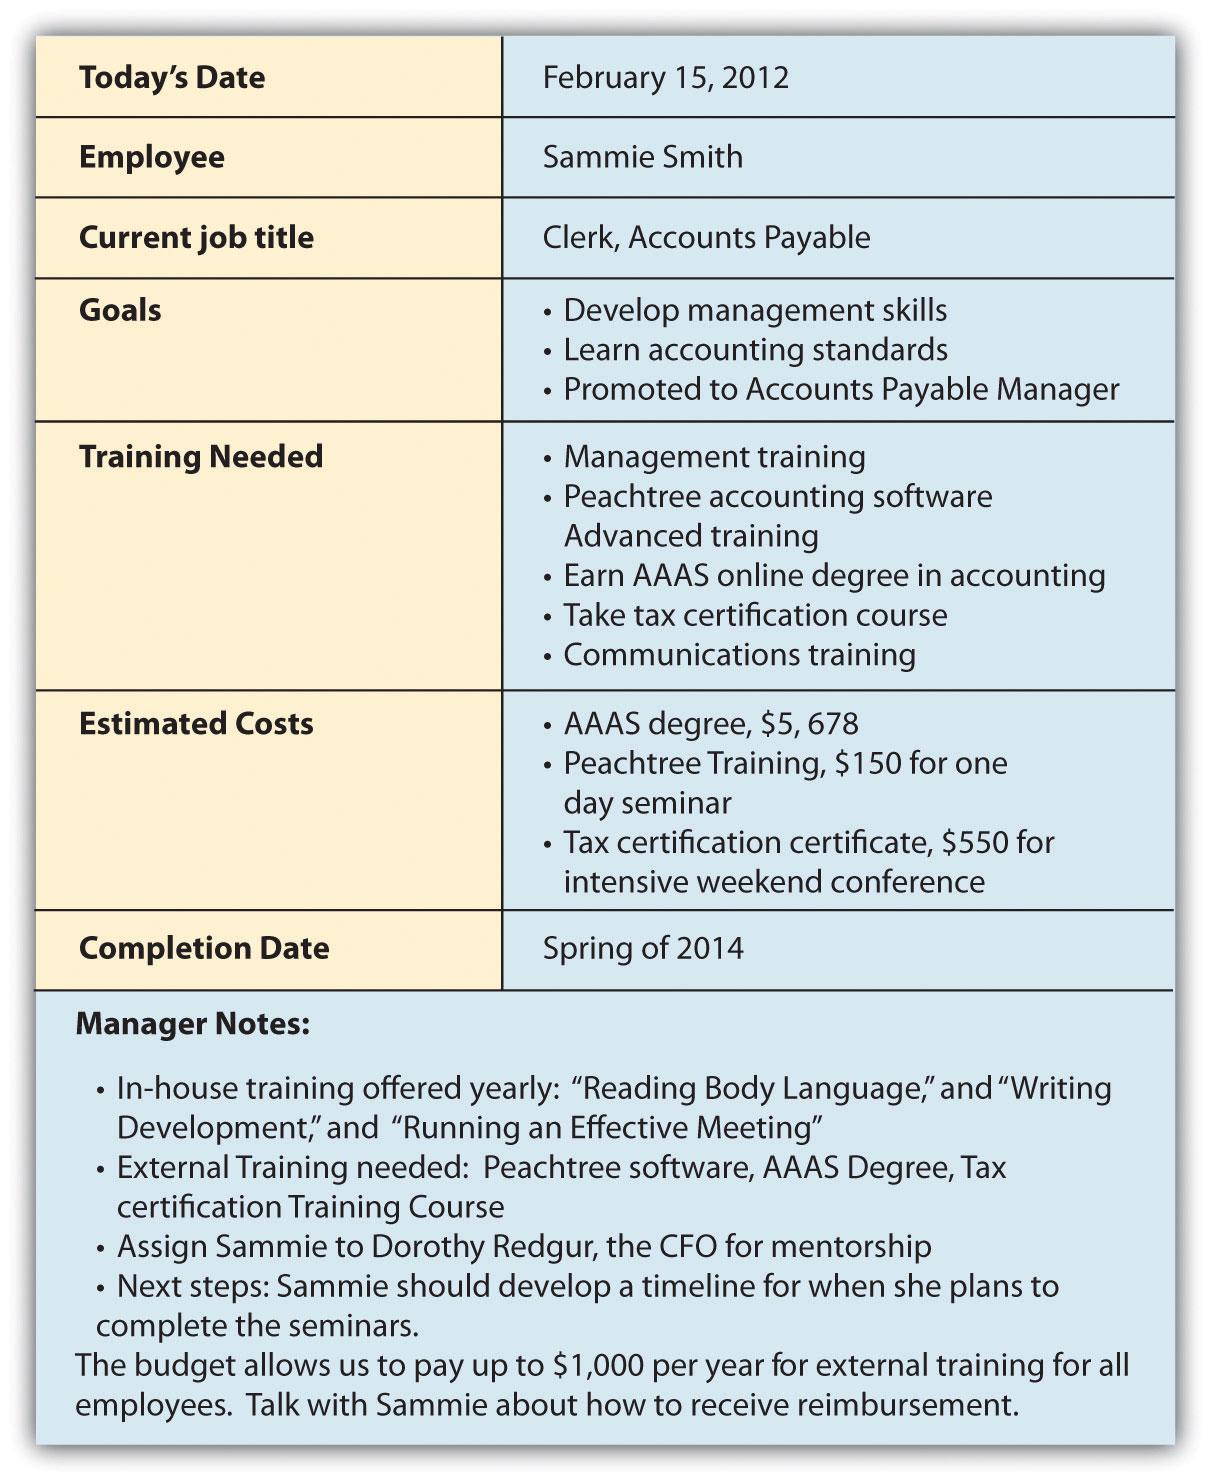 Employee Career Development Plan Examples